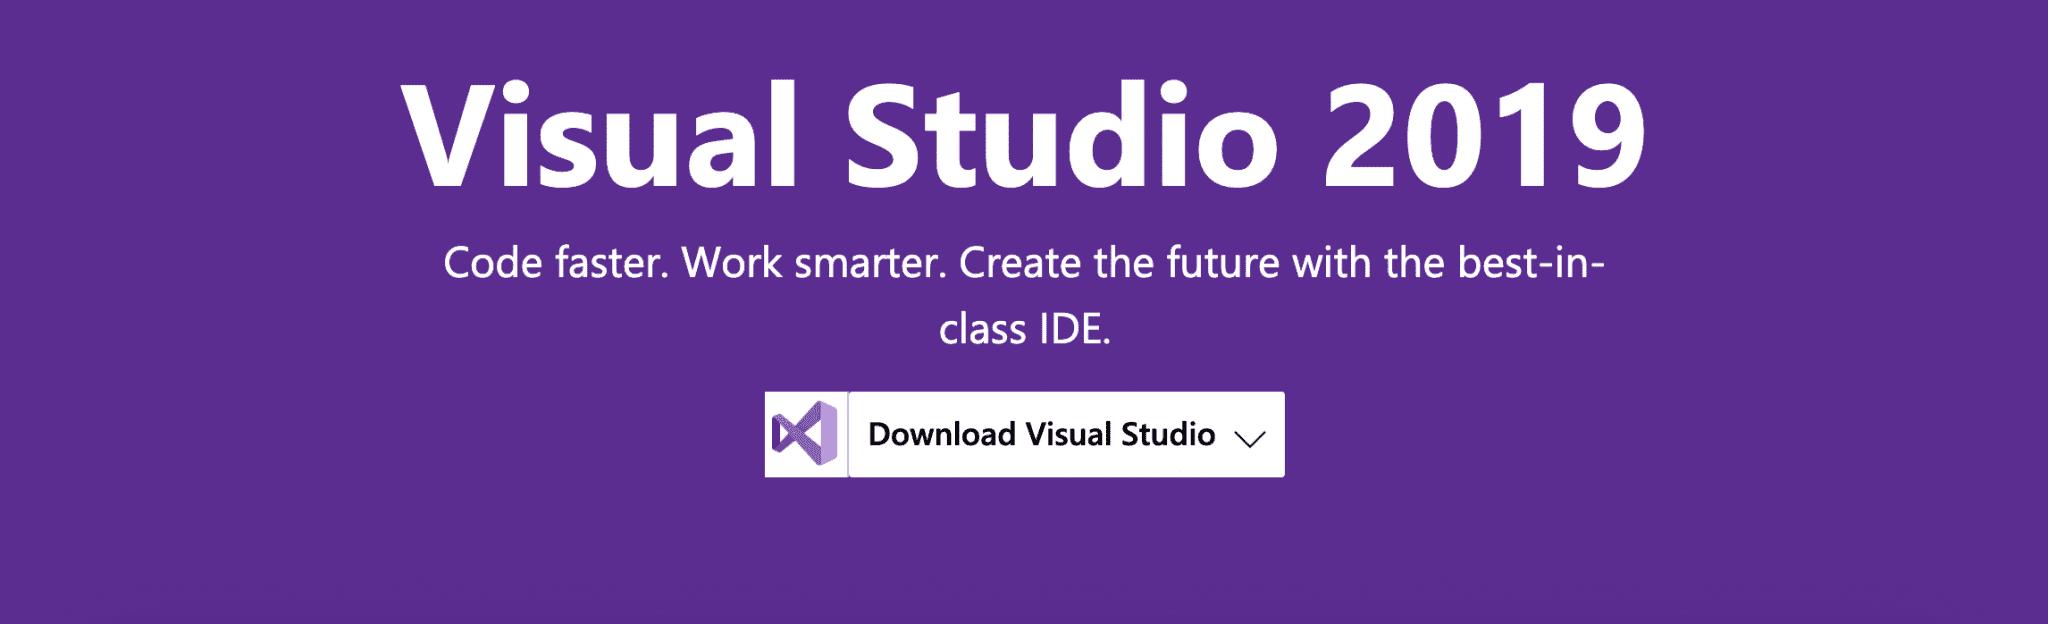 Visual Studio, Microsoft's IDE.